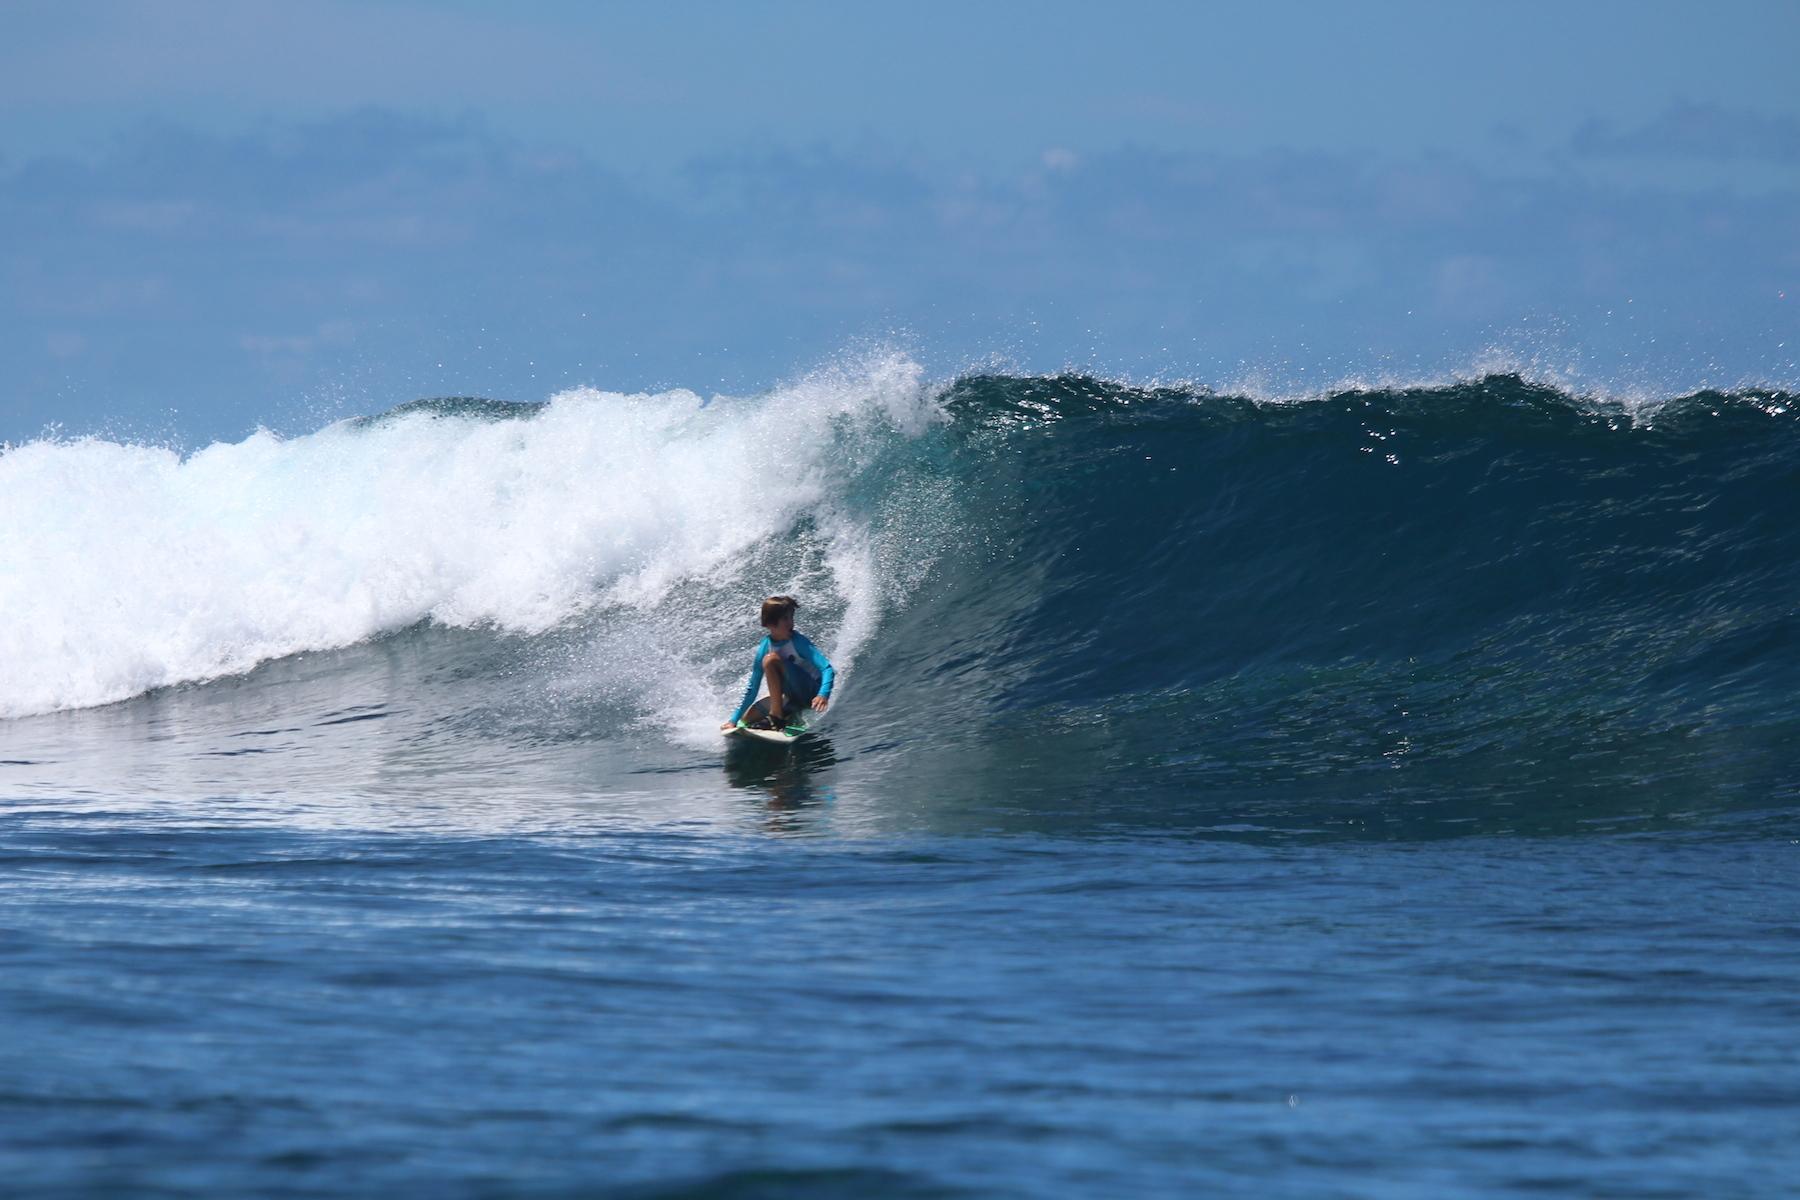 resort latitude zero, Sumatra, Indonesia, latitude zero, Telo Islands, resort, family resort